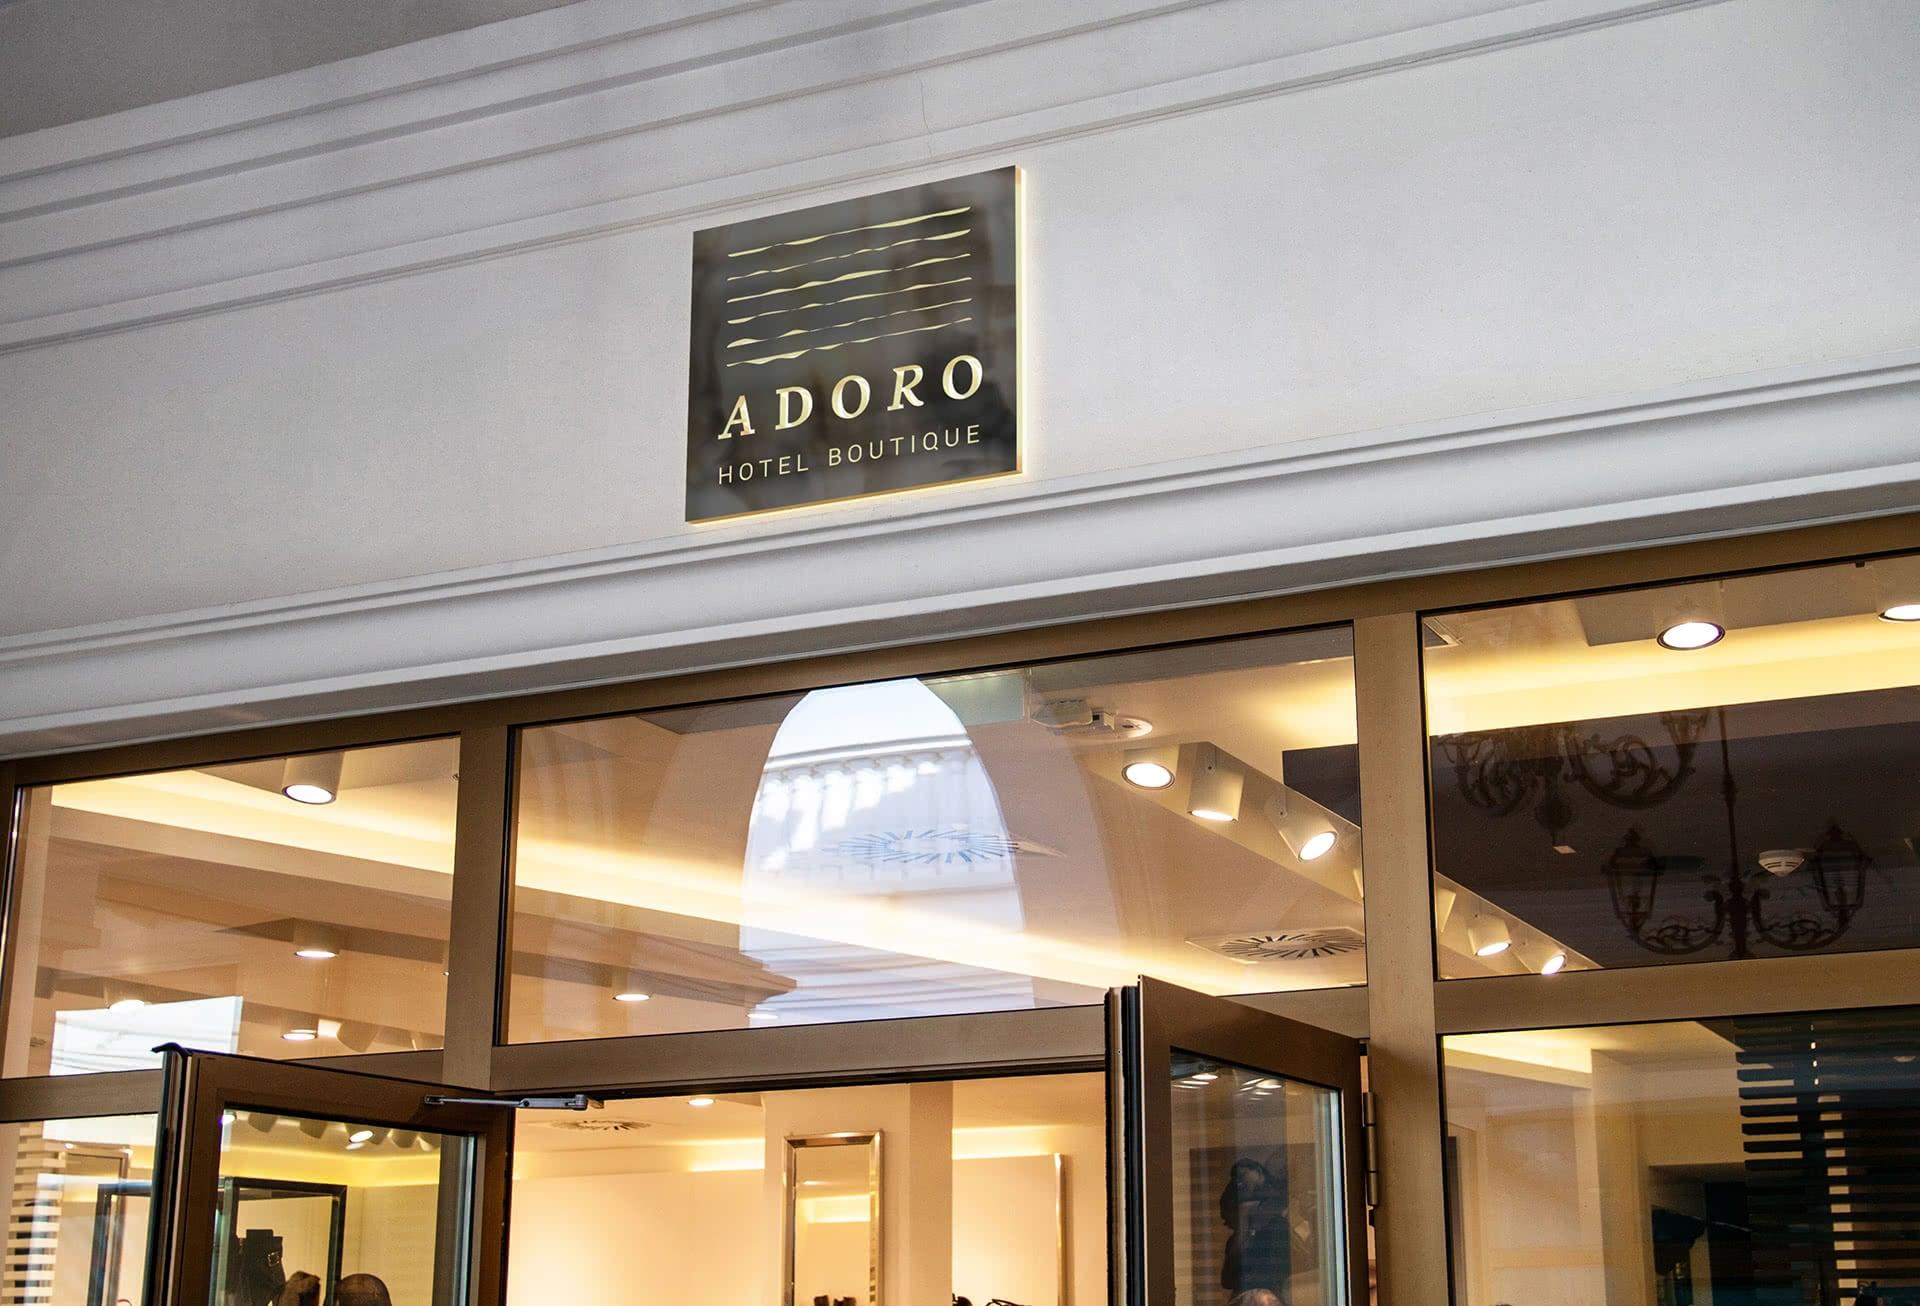 Adoro-branding